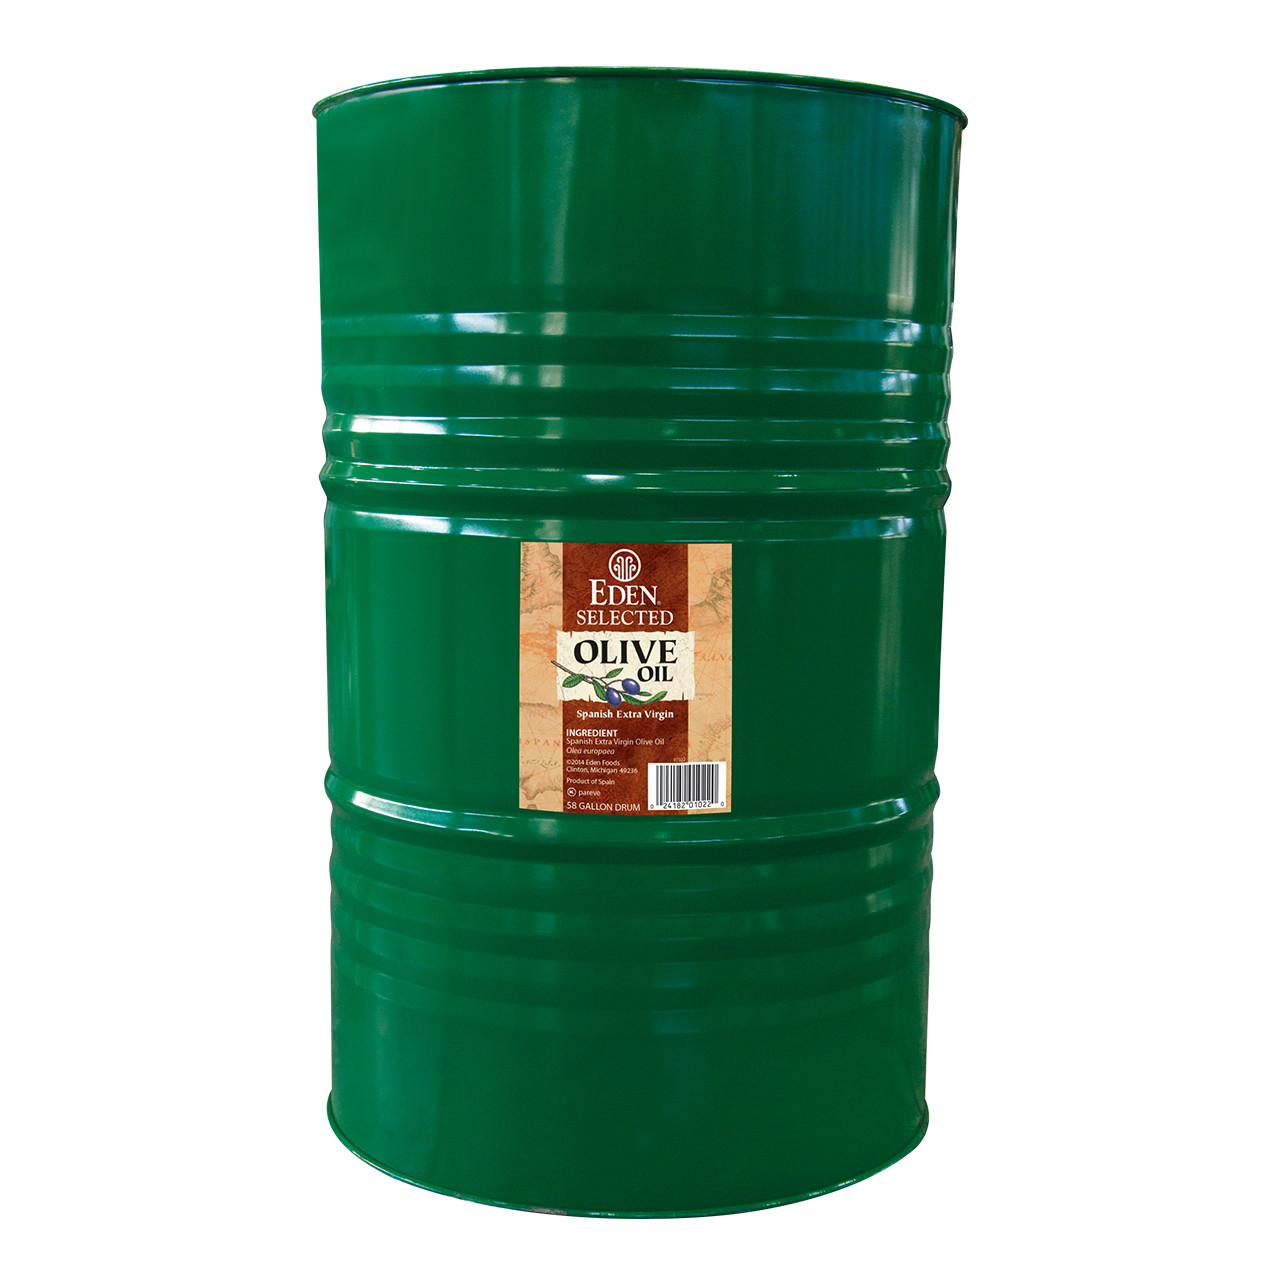 Olive Oil, Extra Virgin, Spanish - 58 gal